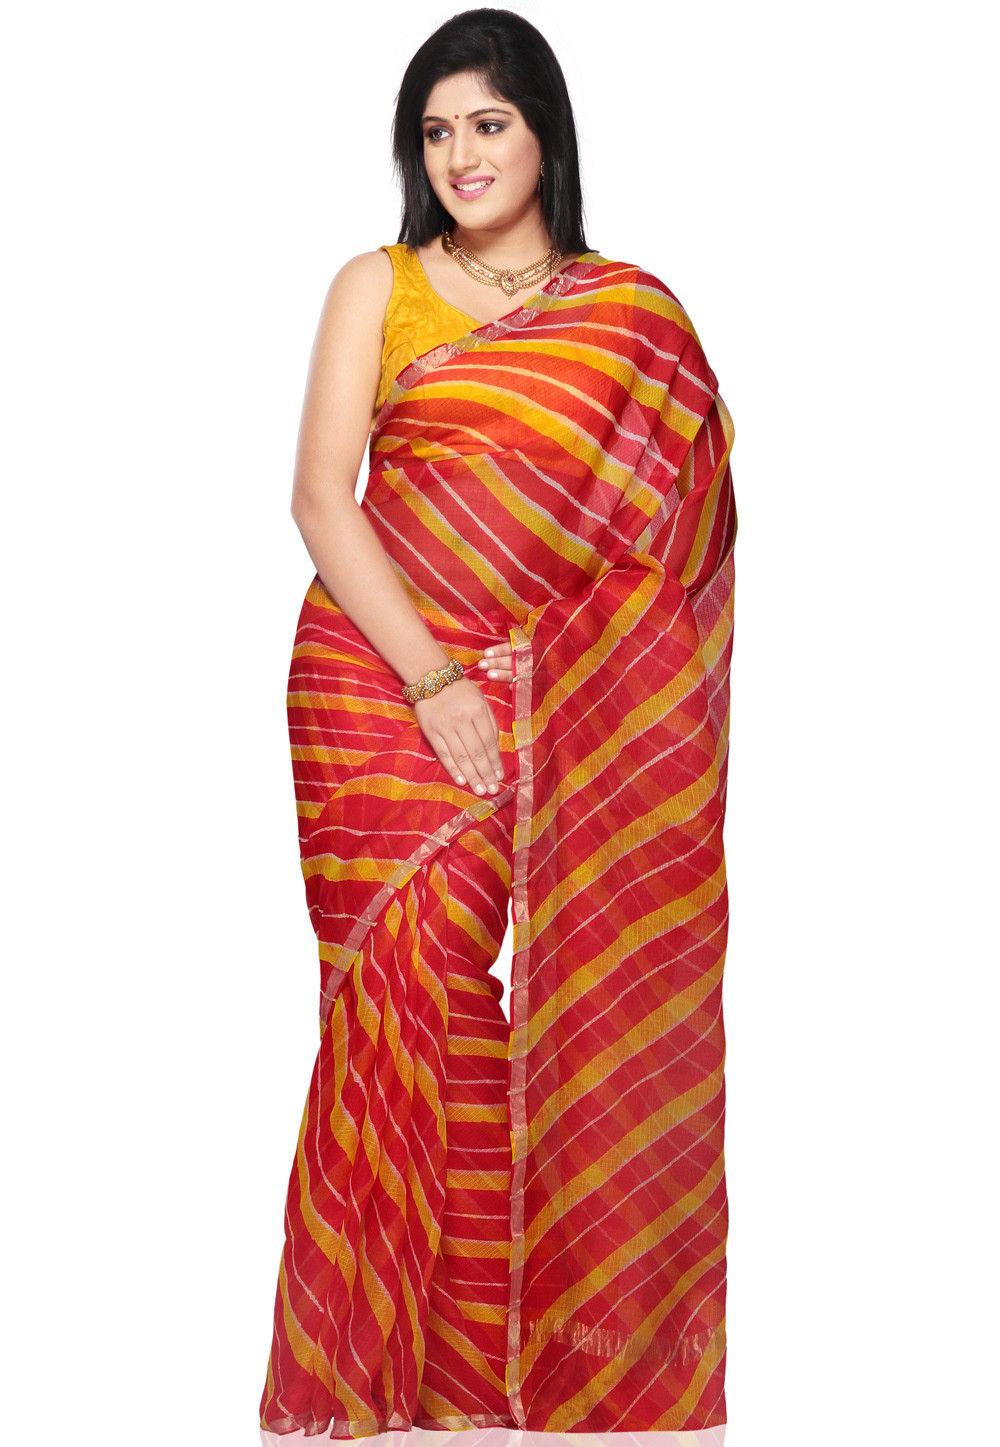 Lehariya Printed Pure Kota Silk in Red and Yellow